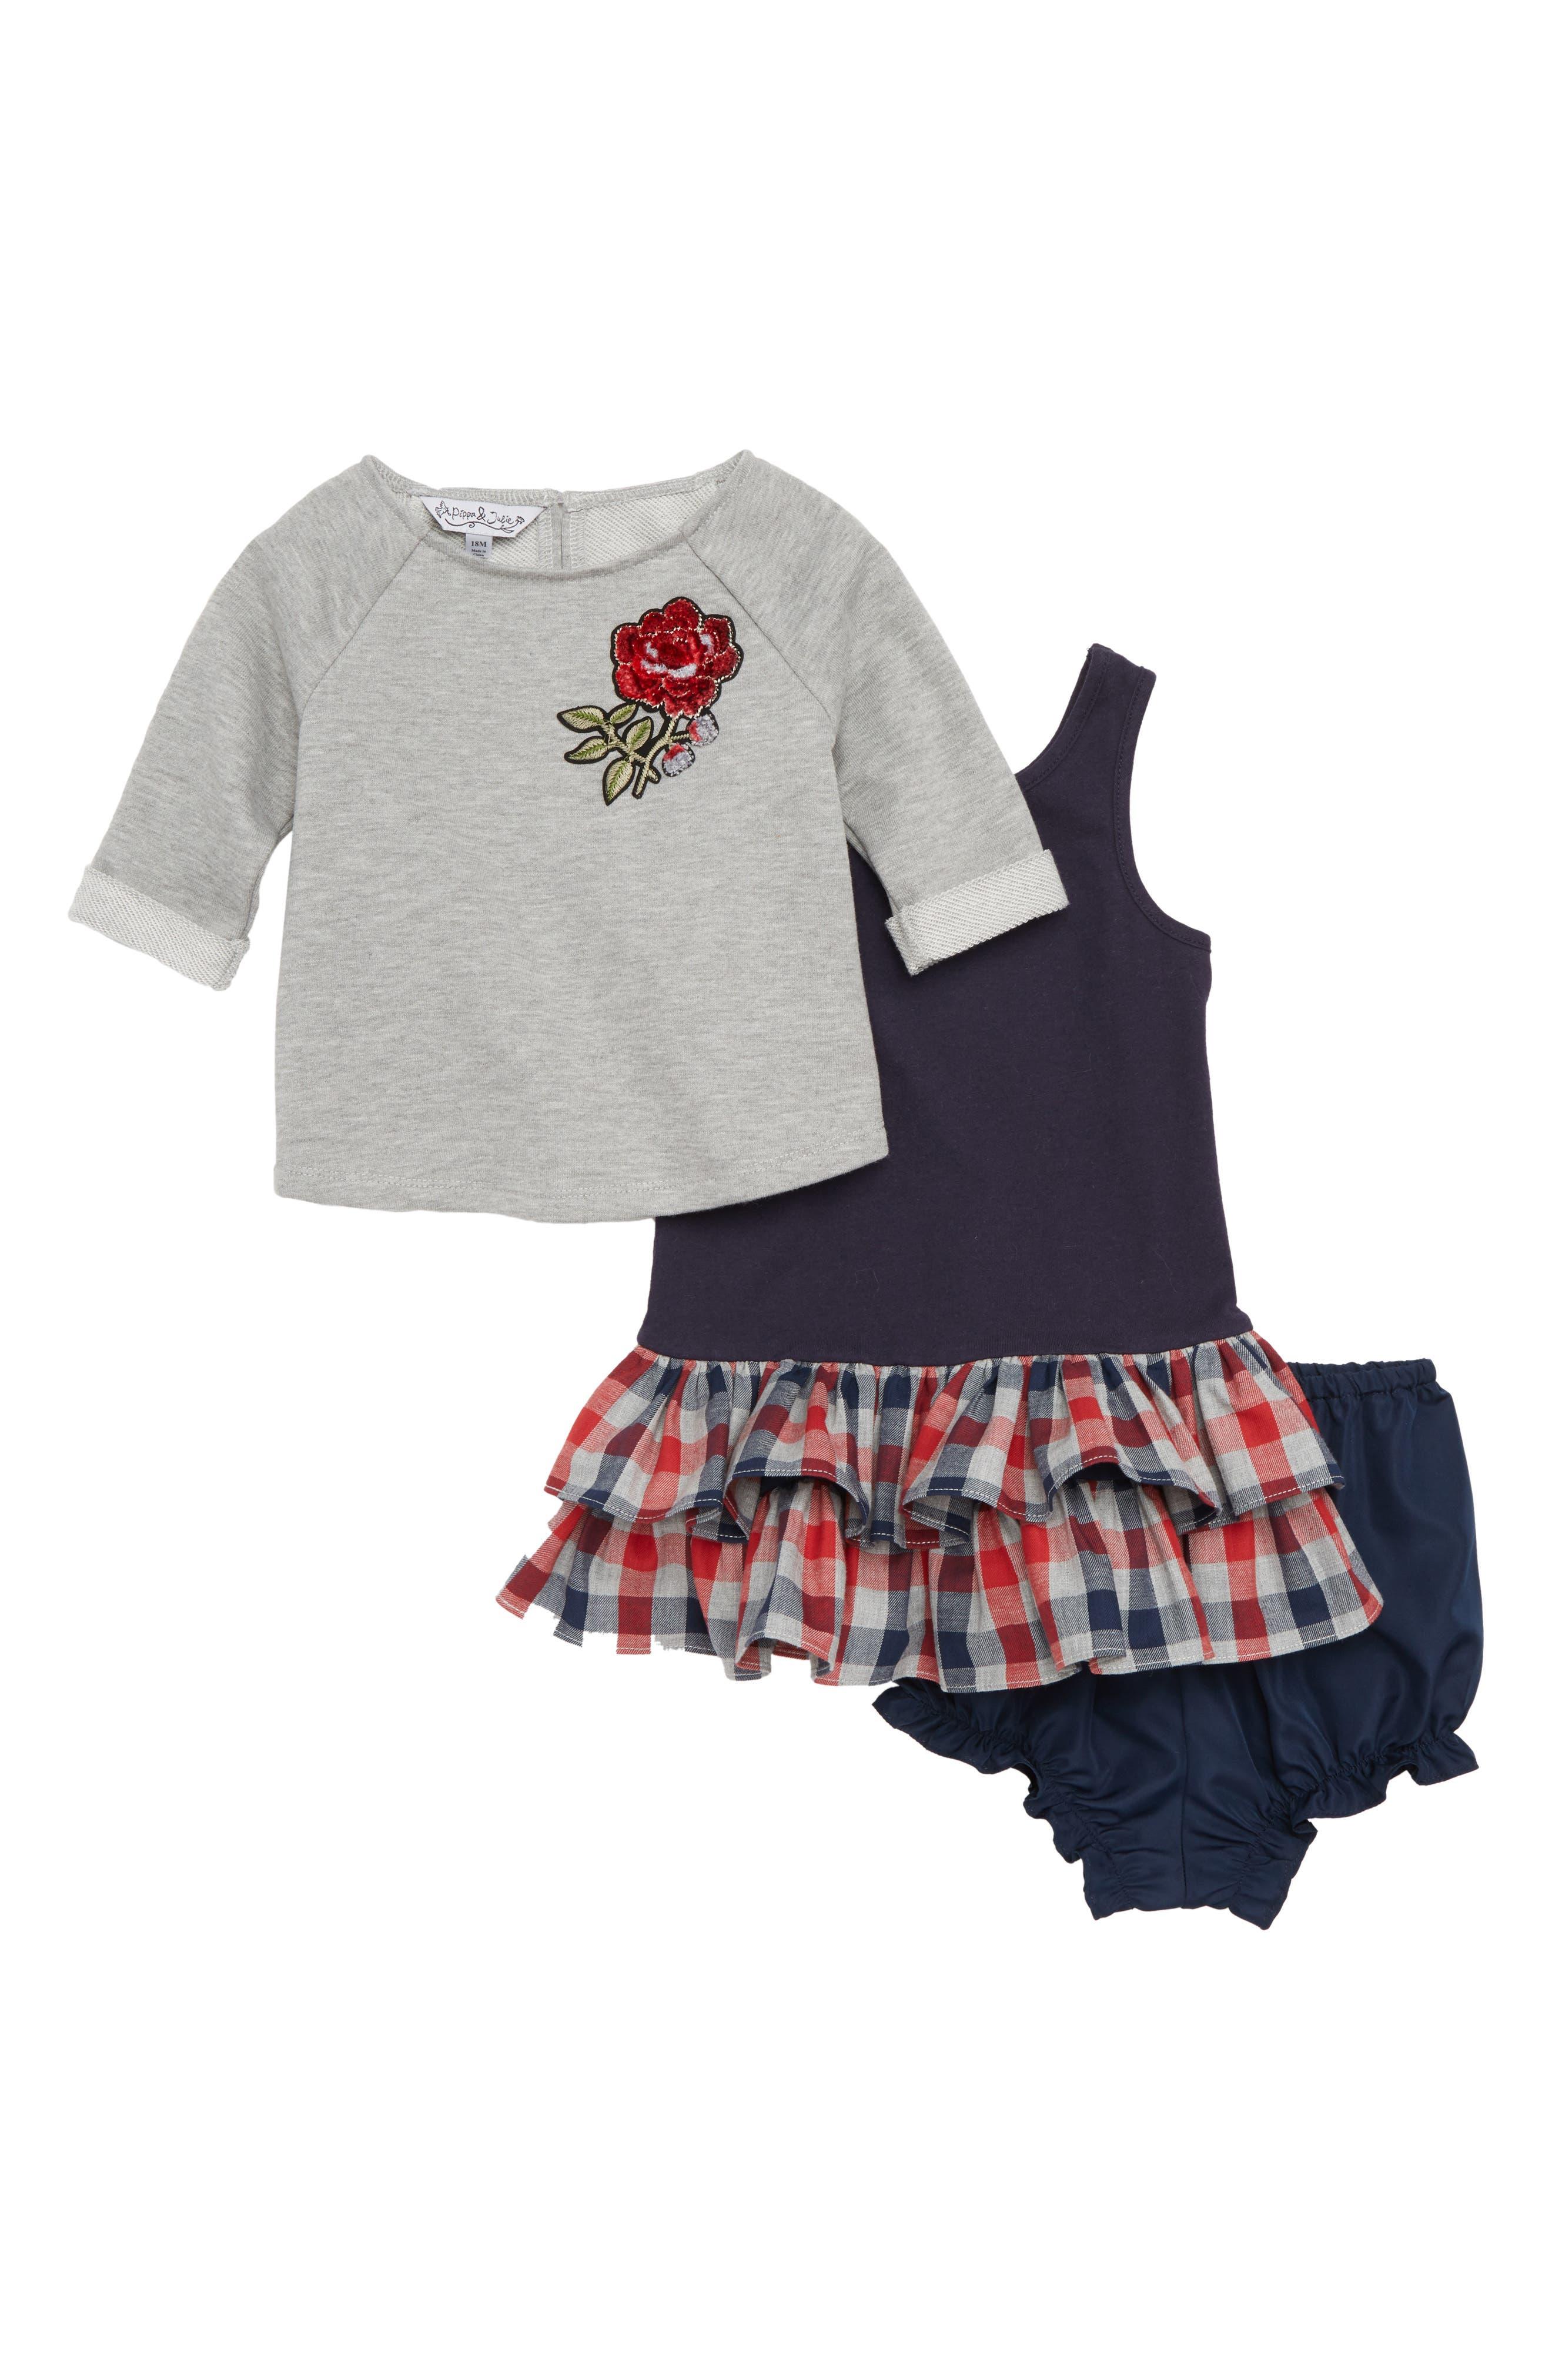 Rose Sweatshirt & Dress Set,                             Main thumbnail 1, color,                             020